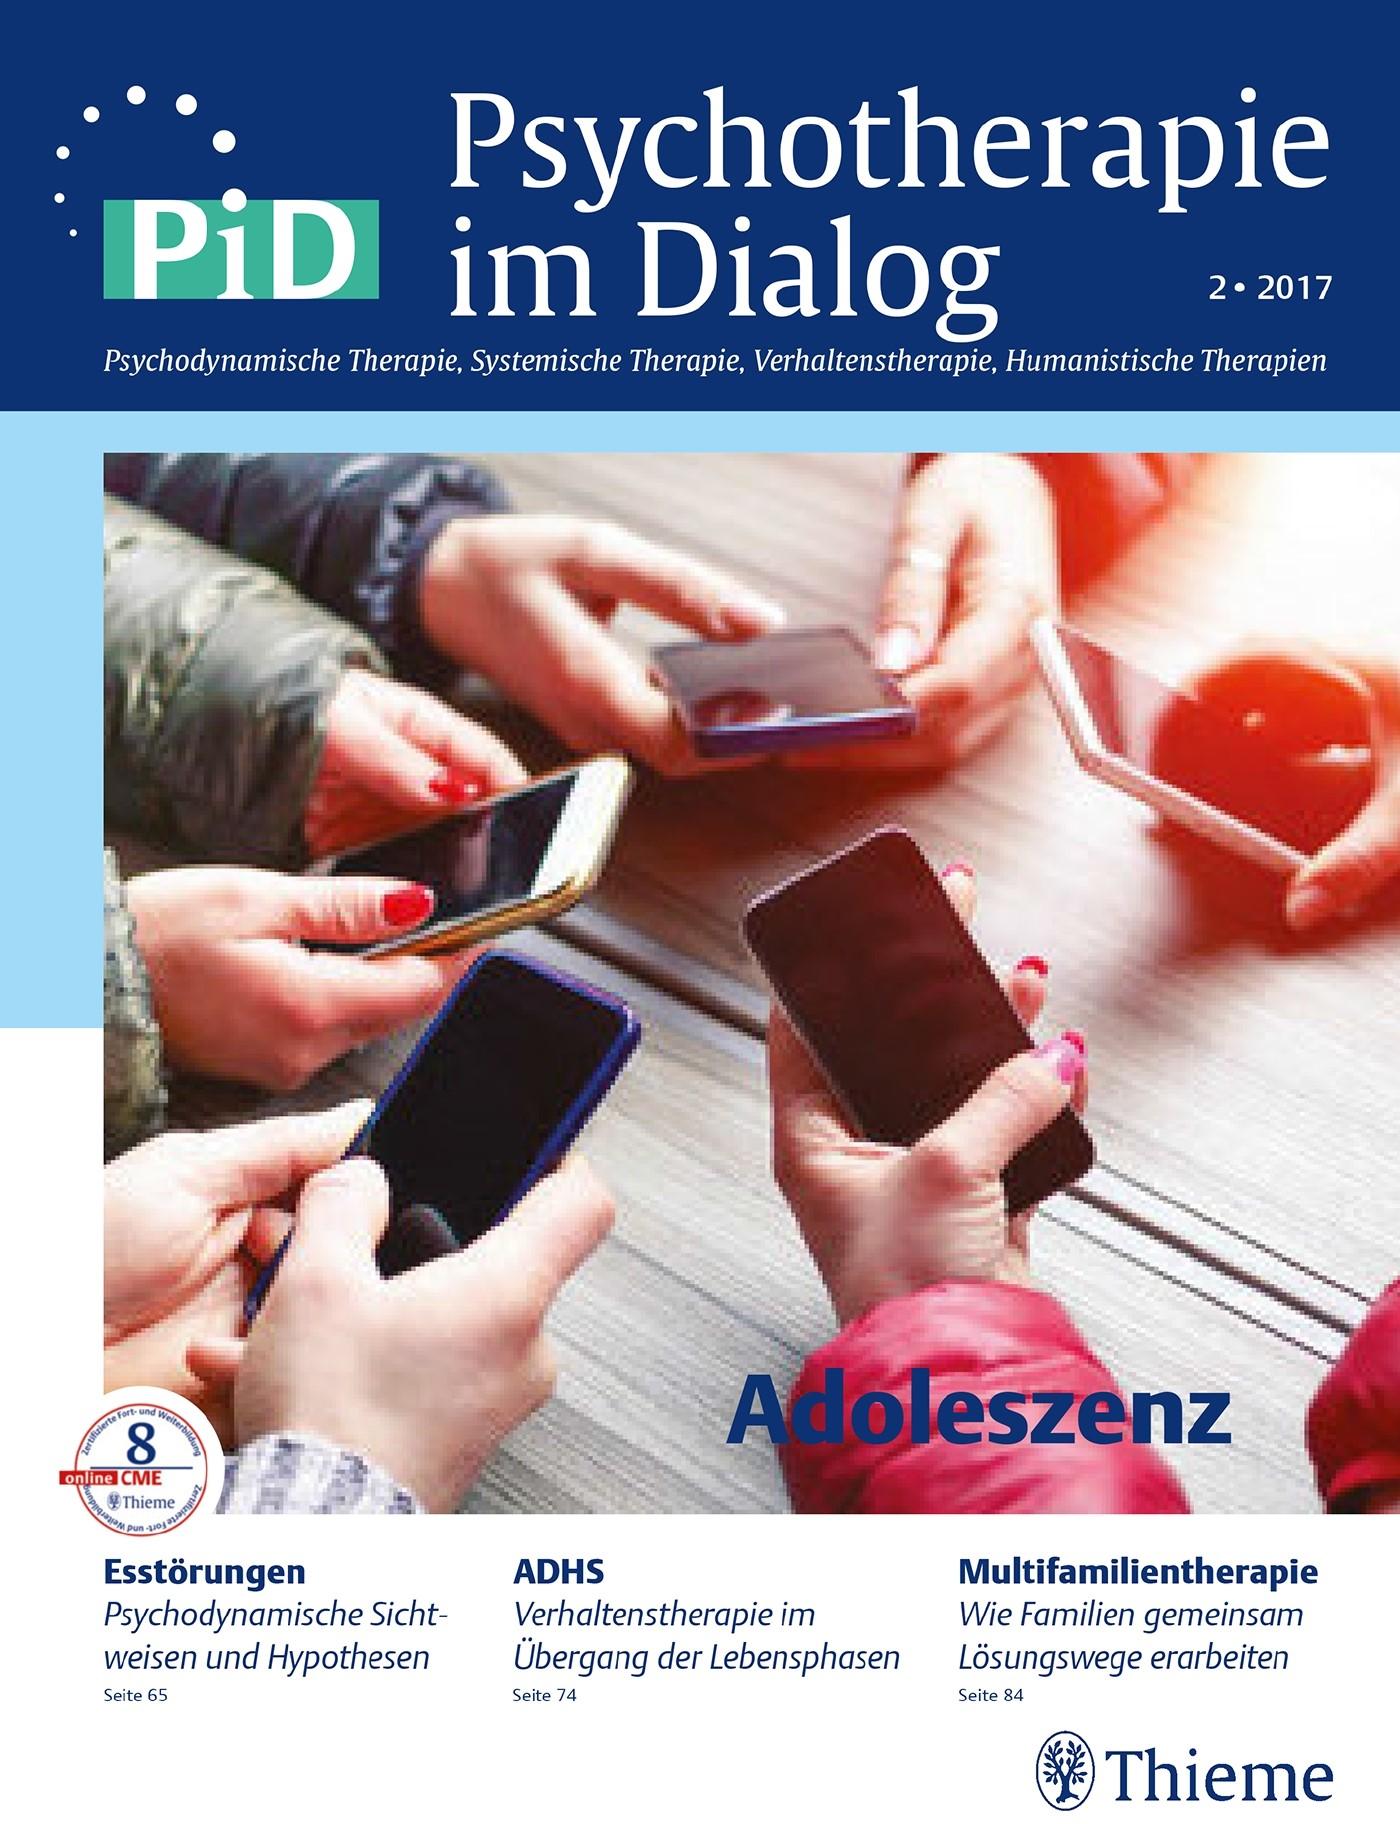 Psychotherapie im Dialog - Adoleszenz | Borcsa / Wiegand-Grefe, 2017 | Buch (Cover)